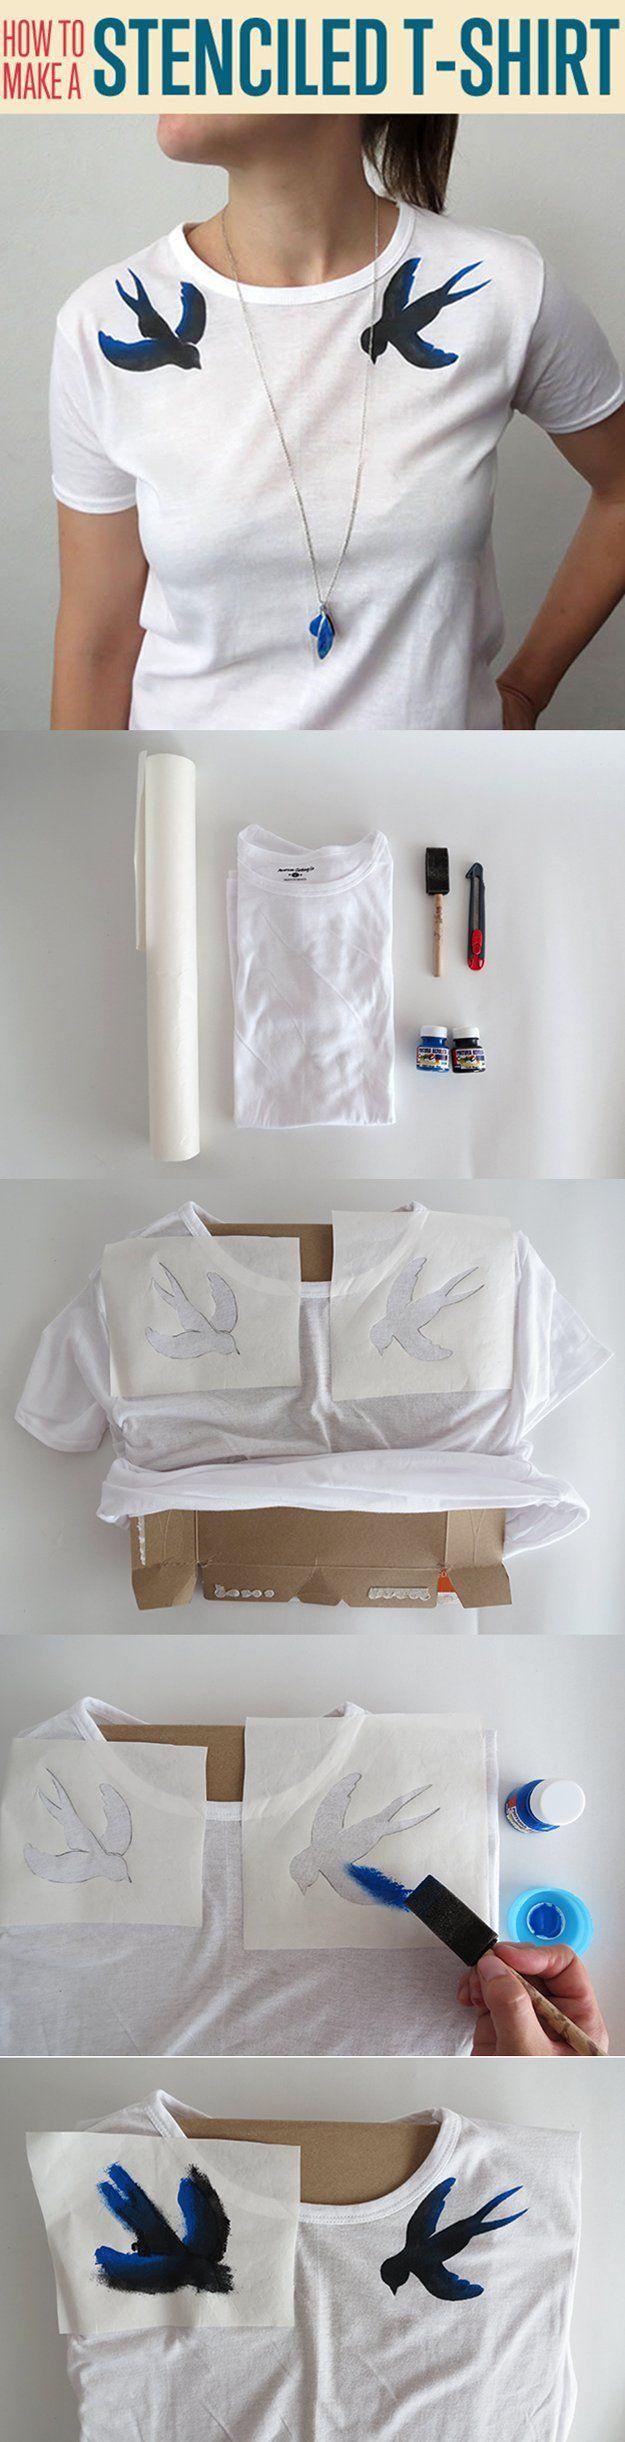 Simple DIY Top Design for Women   diyready.com/diy-clothes-sewing-blouses-tutorial/